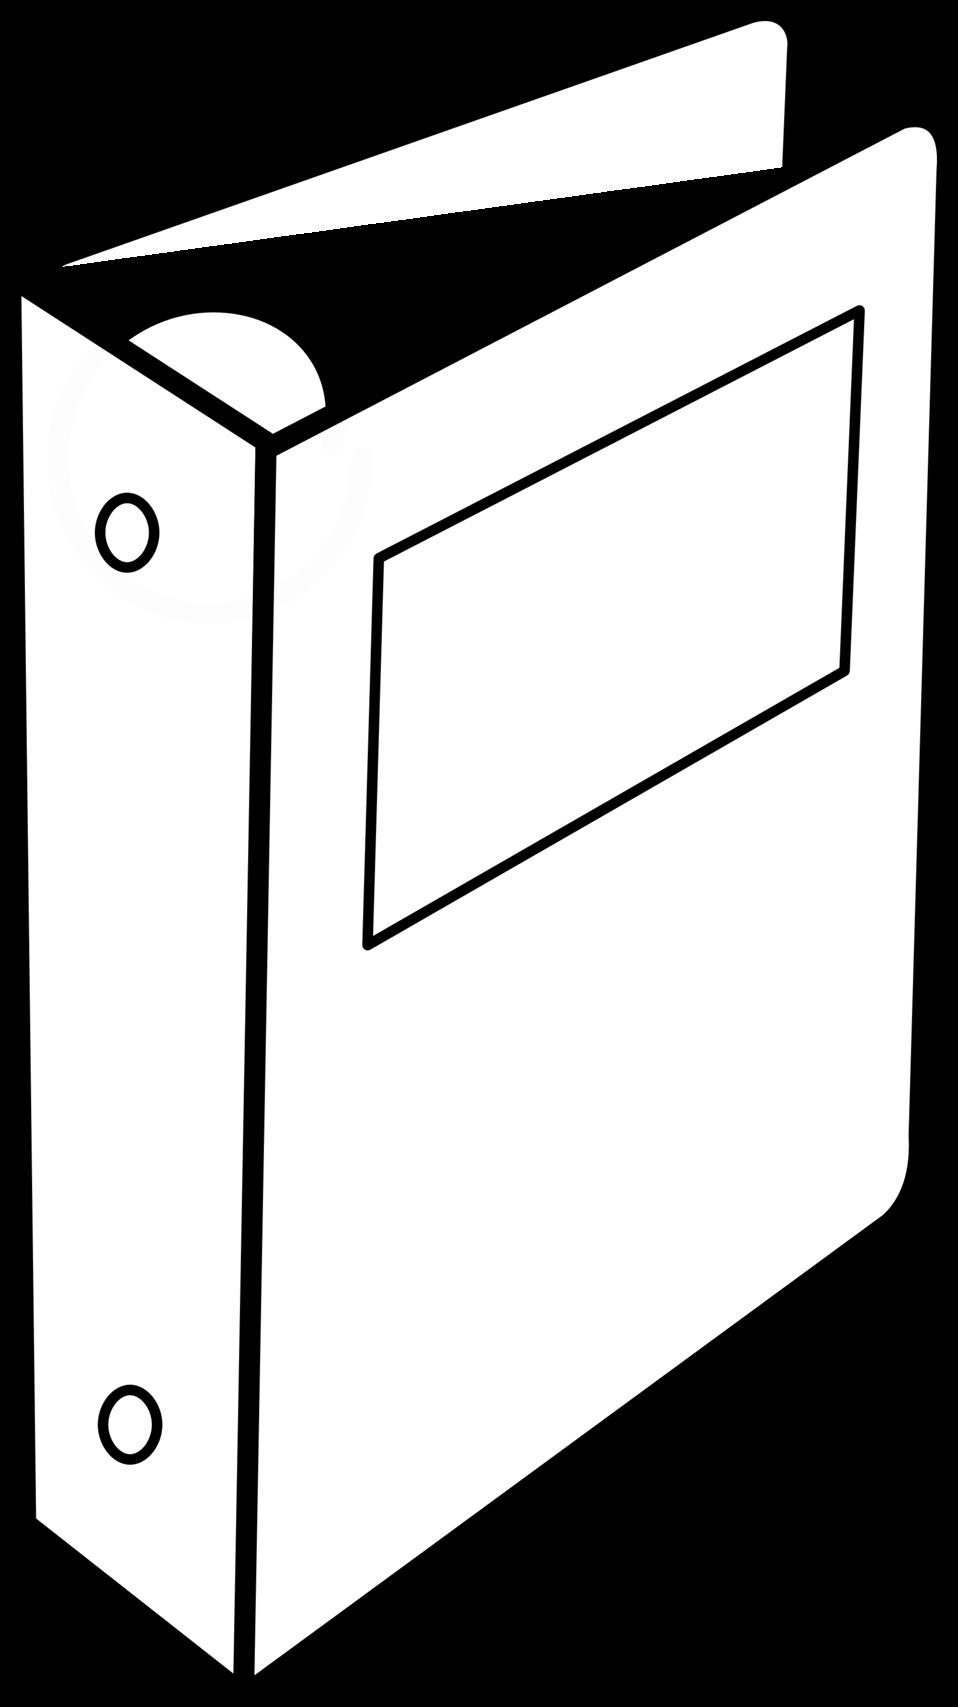 Cartable à anneaux / Binder